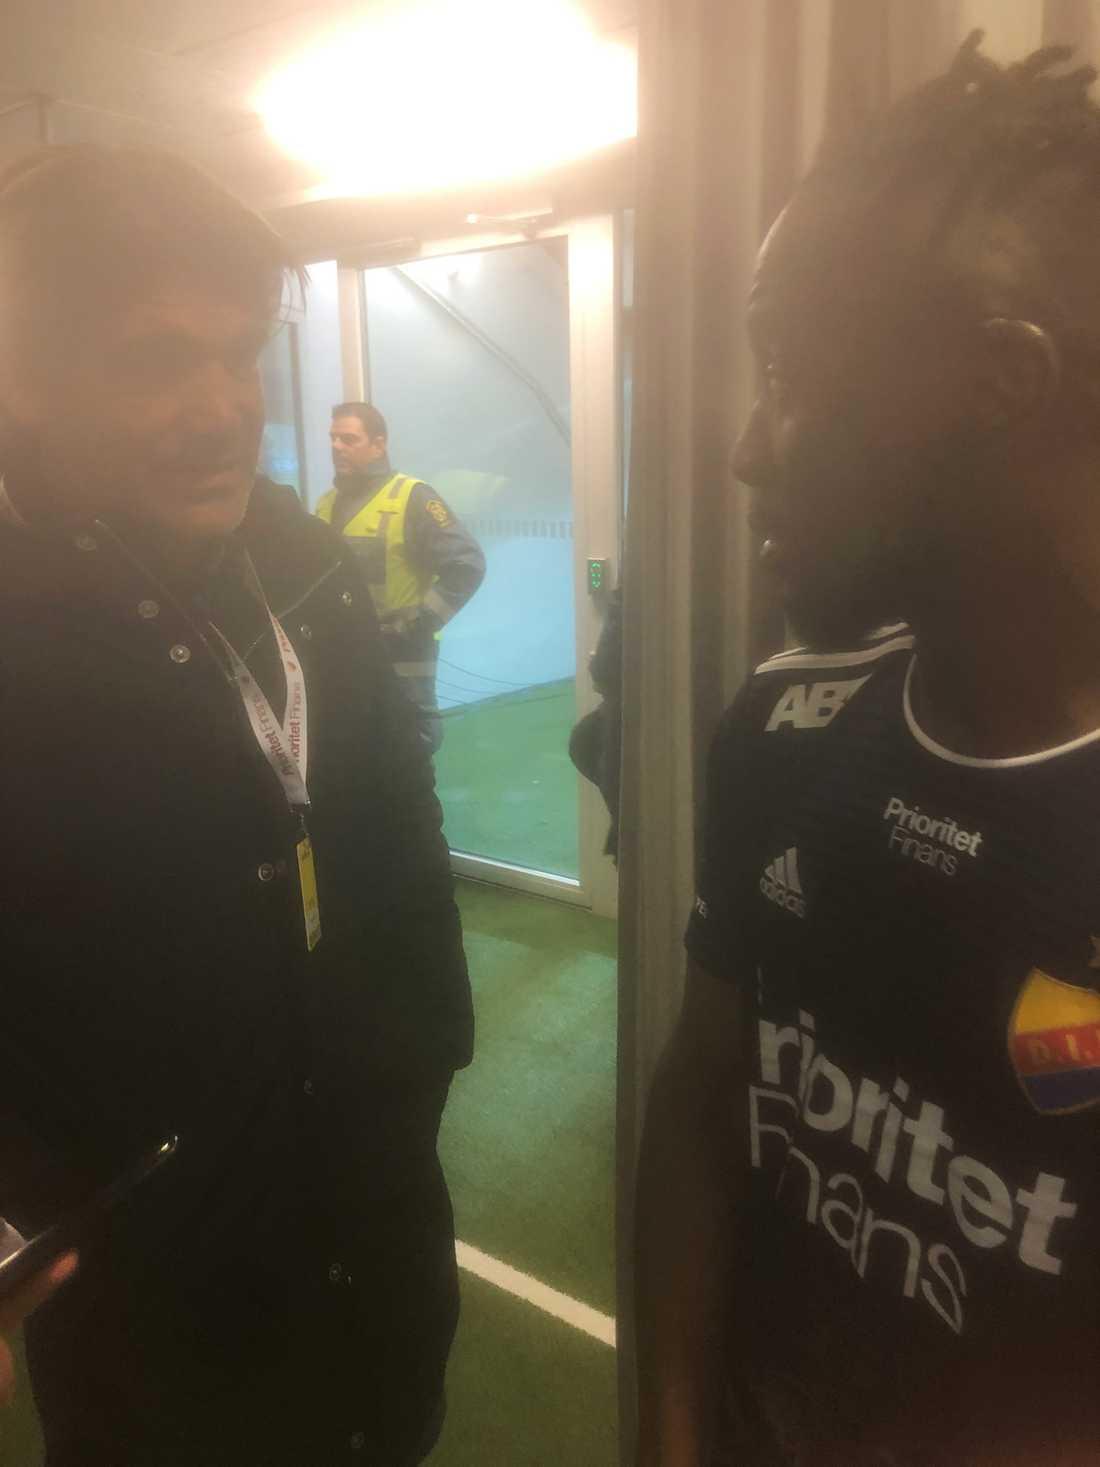 Bosse Andersson och Buya Turay i diskussion efter matchen.